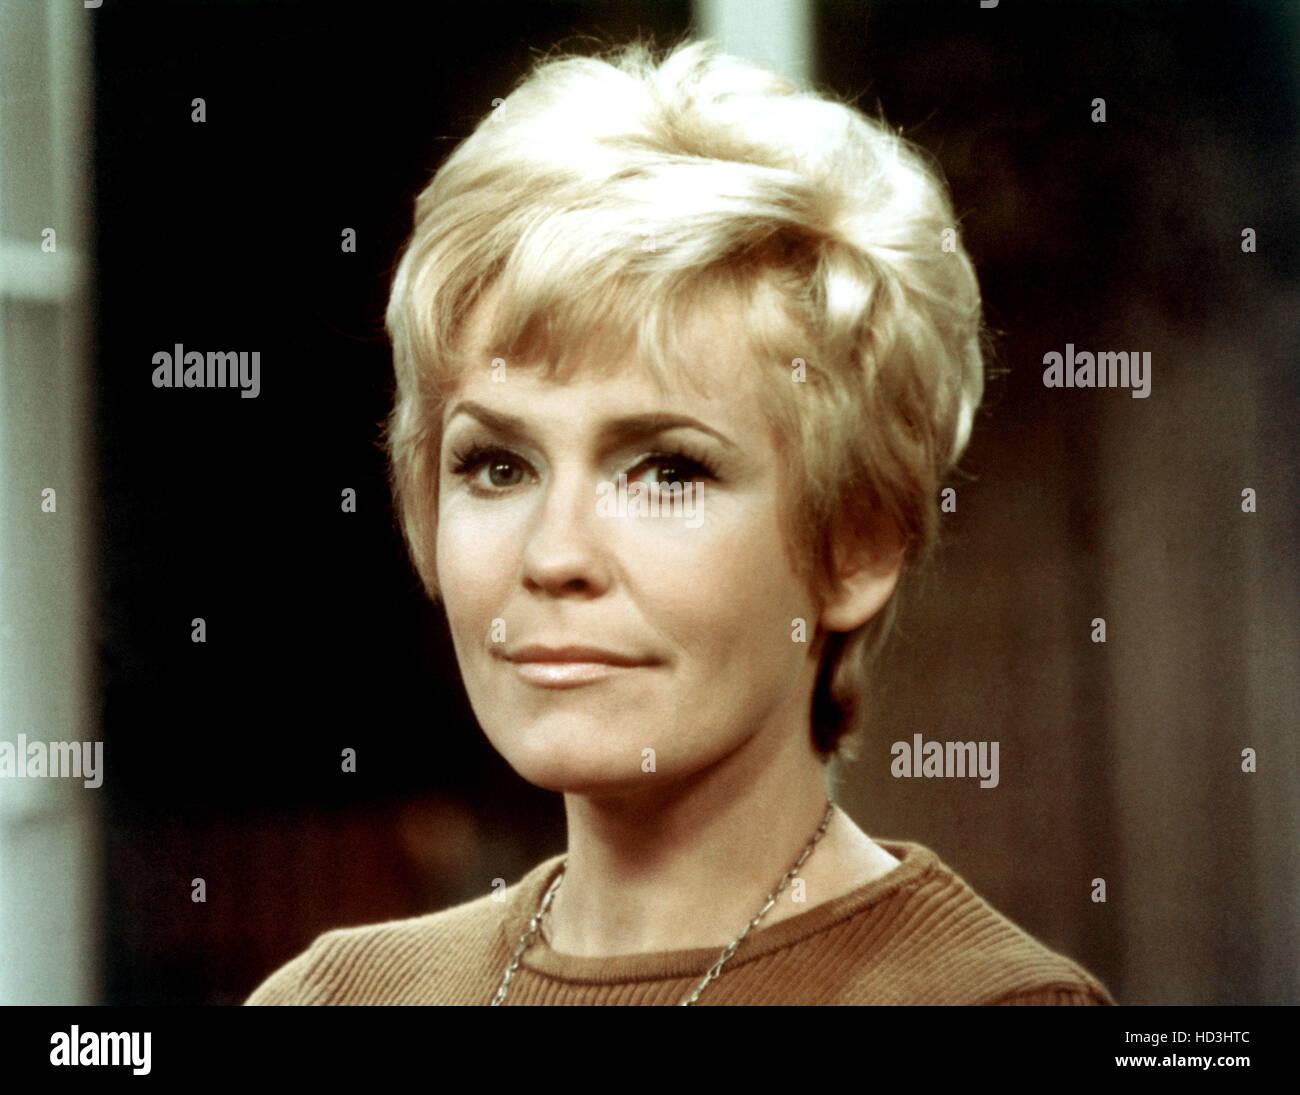 WHERE THE HEART IS, Diana van der Vlis, 1969-73 Stock Photo